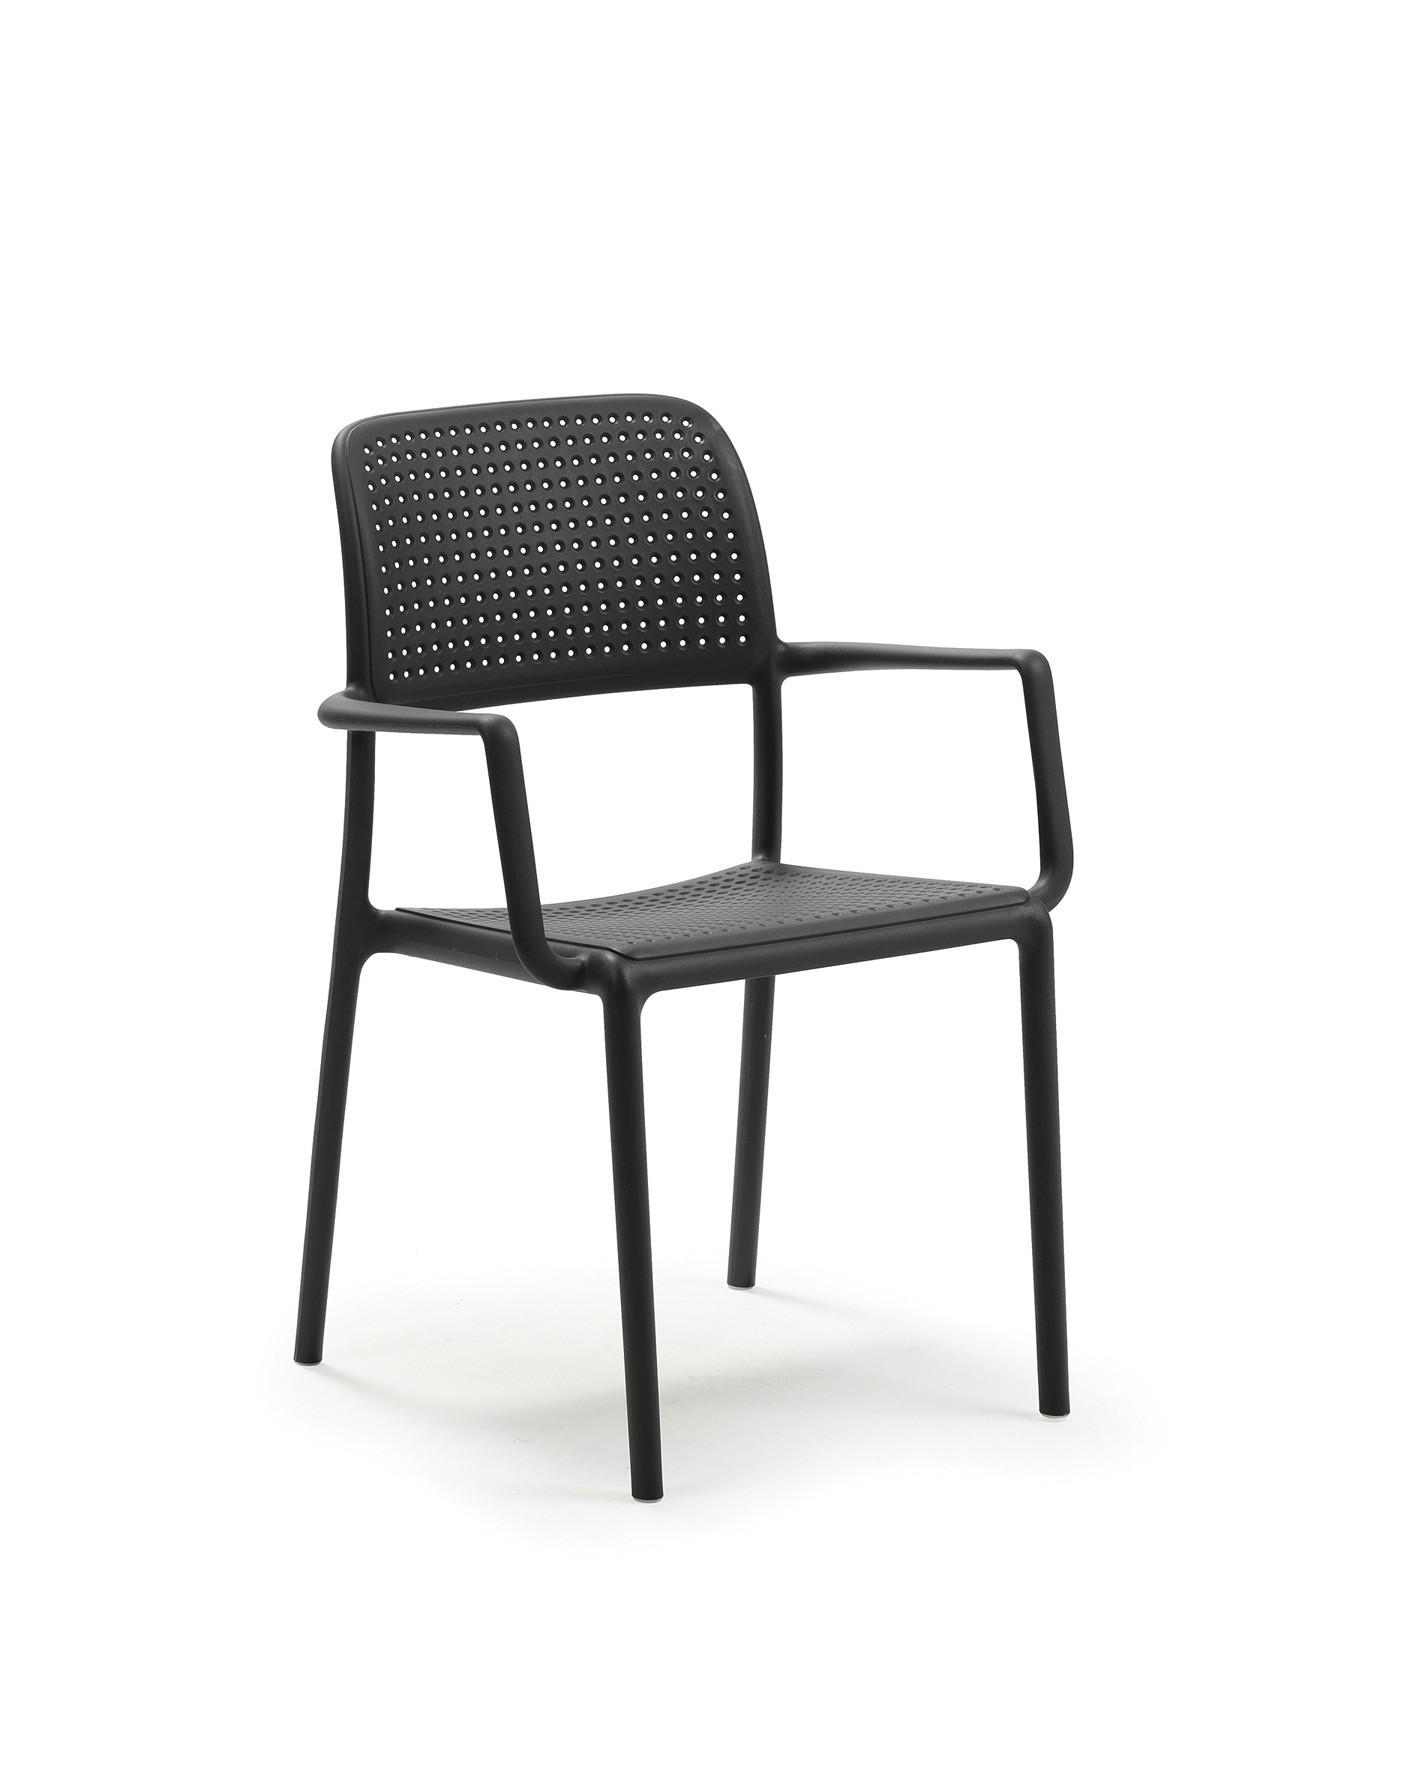 stapelstuhl gartenstuhl bora kunststoff stapelbar anthrazit bei. Black Bedroom Furniture Sets. Home Design Ideas